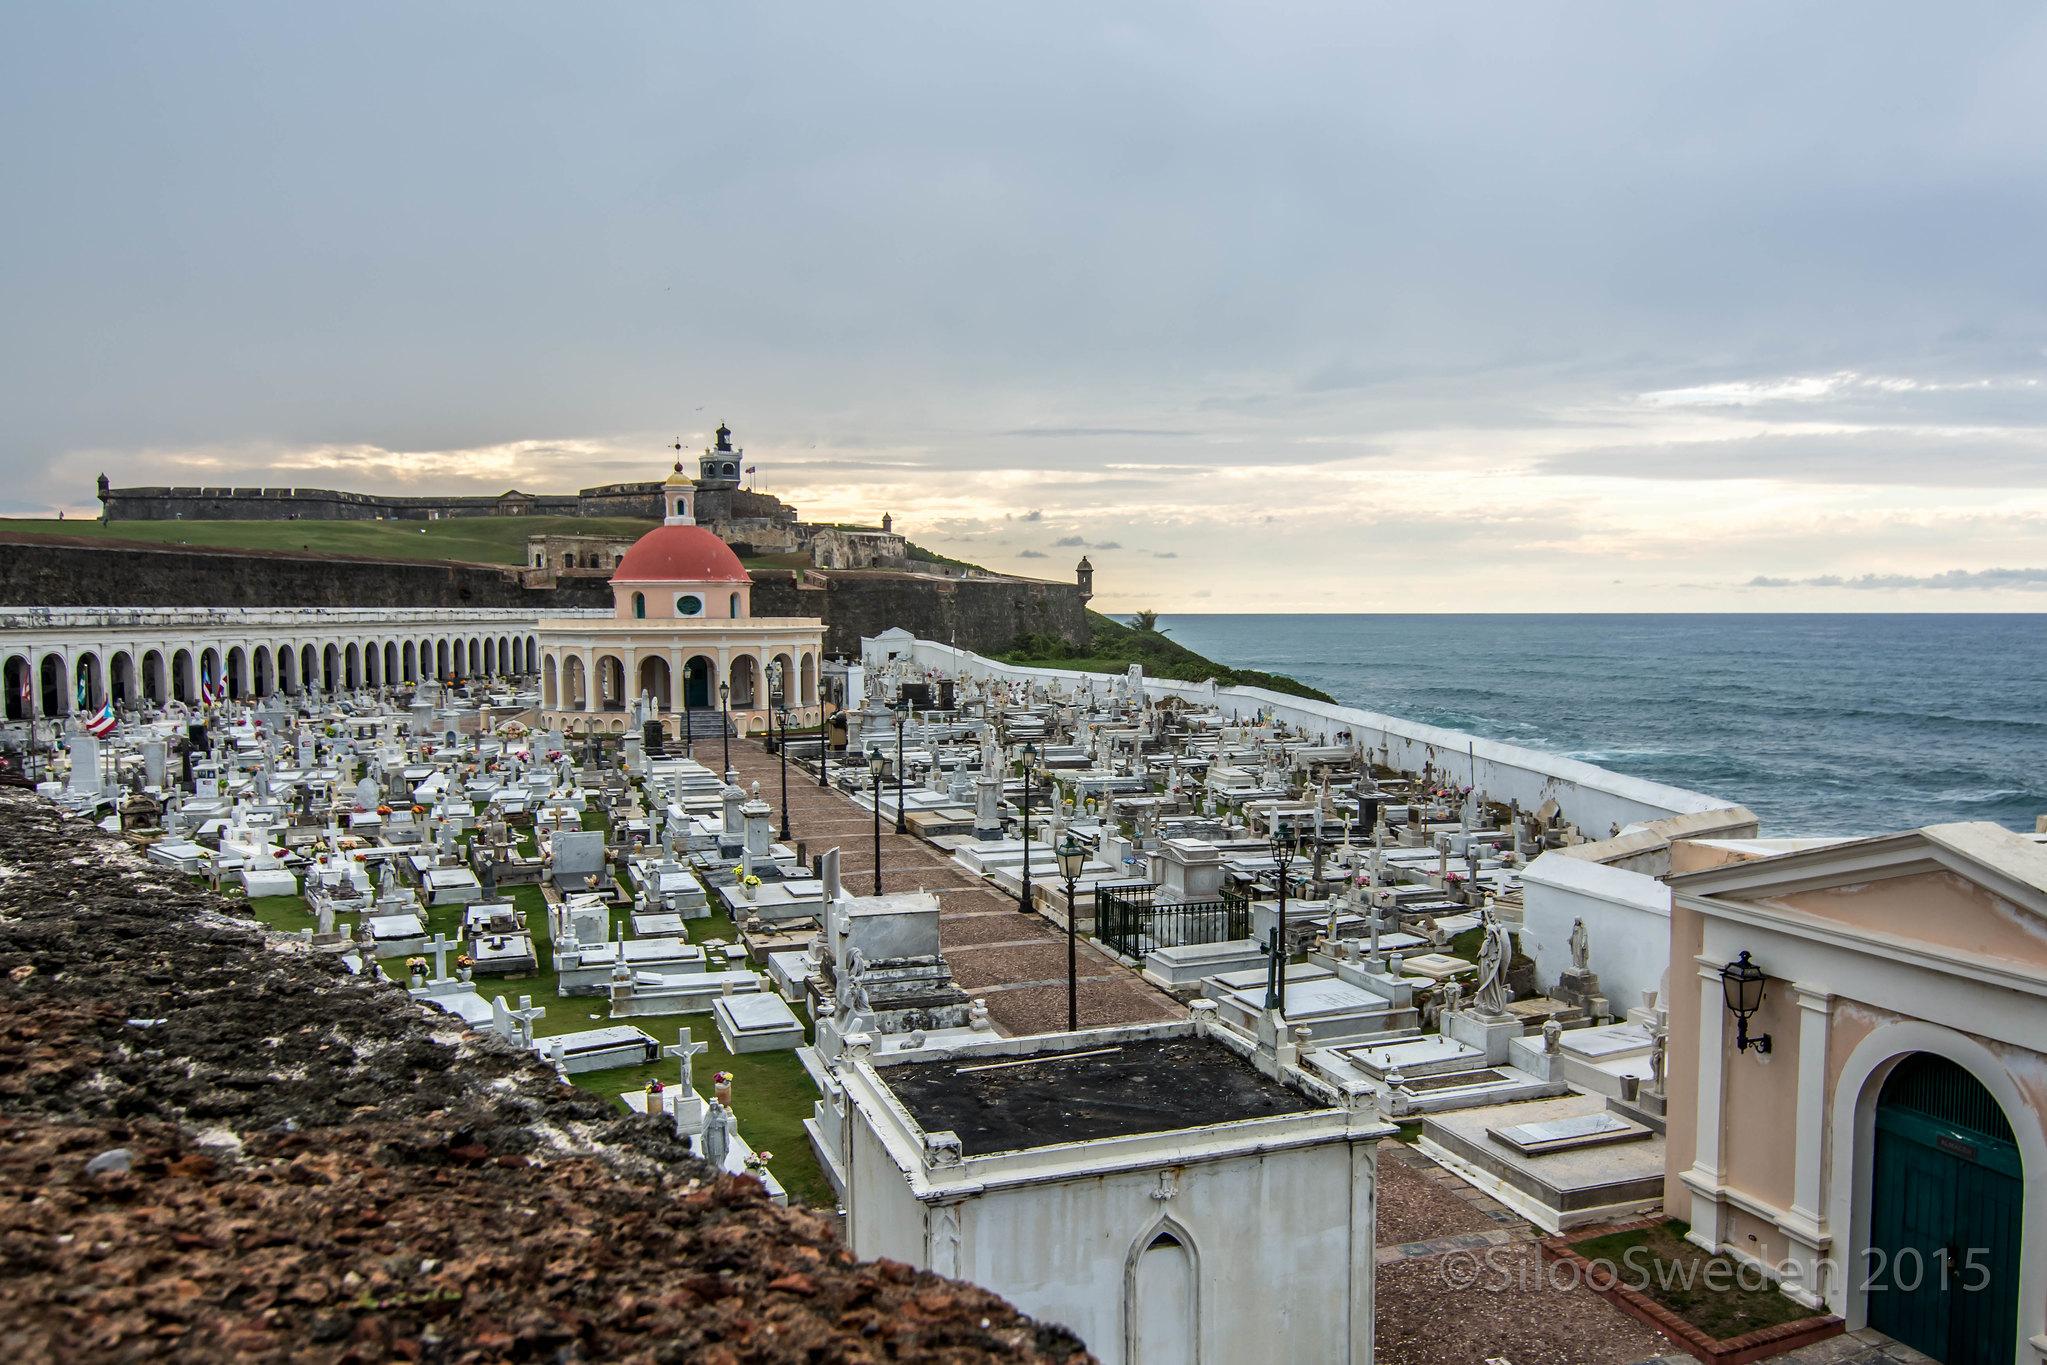 20151023_San Juan, Puerto Rico 21.jpg